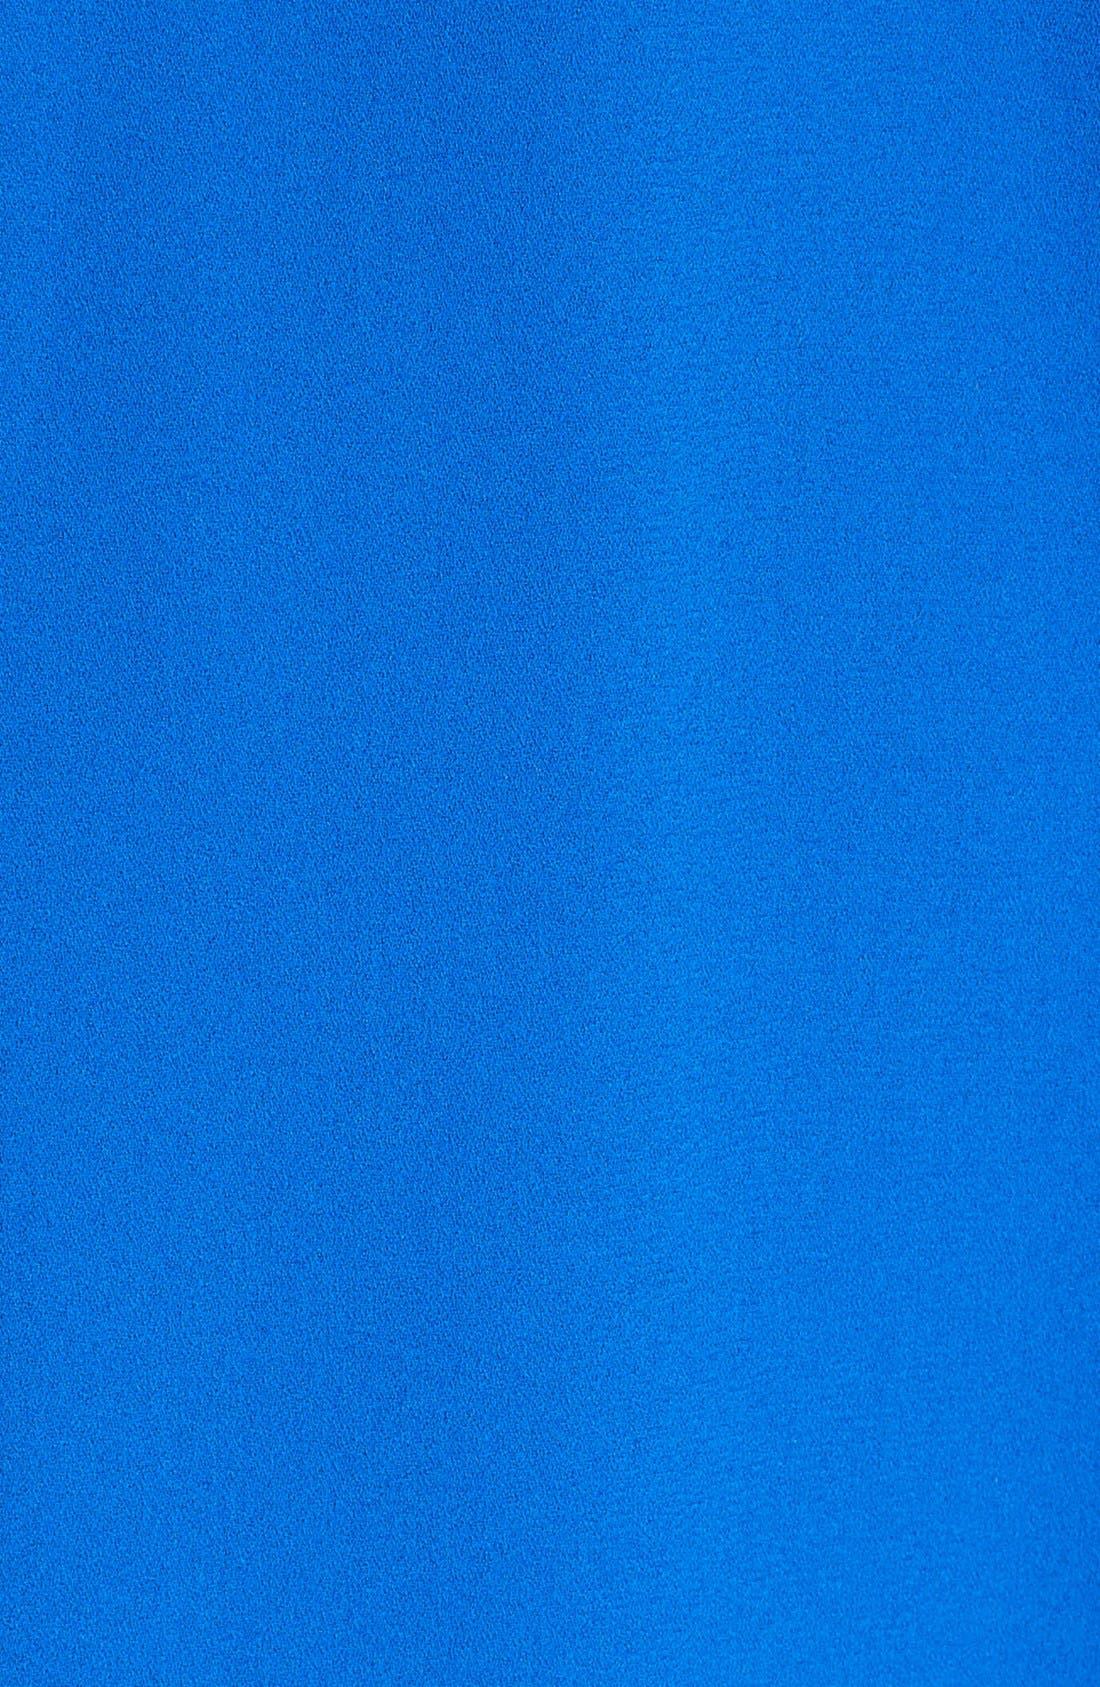 Leather Trim Trapeze Crepe Dress,                             Alternate thumbnail 4, color,